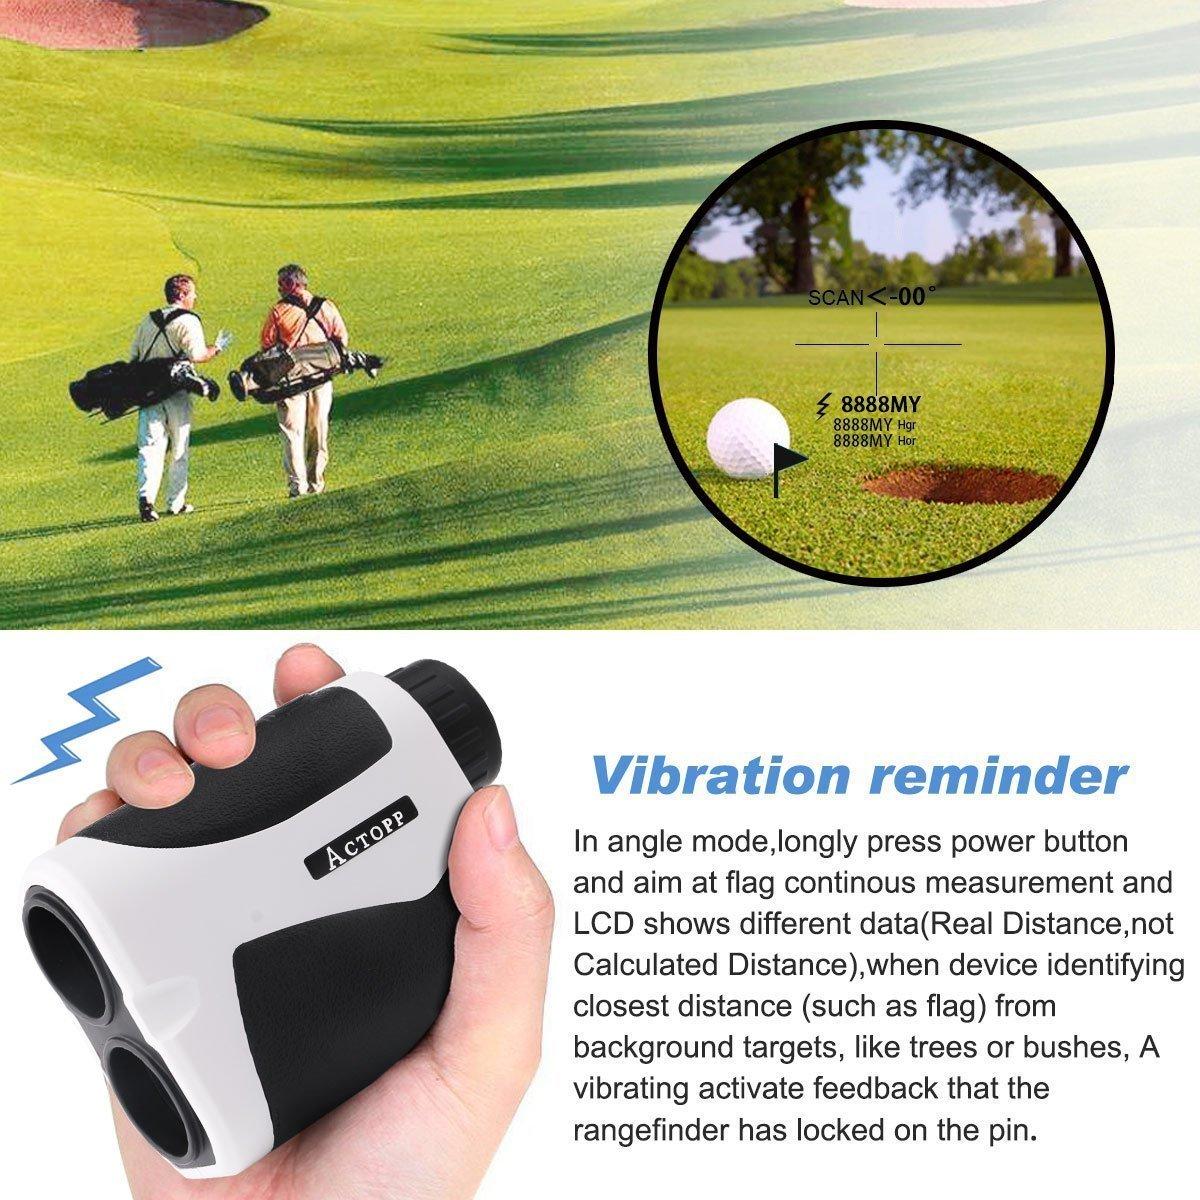 ACTOPP Golf Telémetro Láser Mide 6x21 / 600 Telémetro Láser de Golf Telémetro Laser con Ferias Horizontales Ángulo de Elevación de Pesca Caza Estudio ...